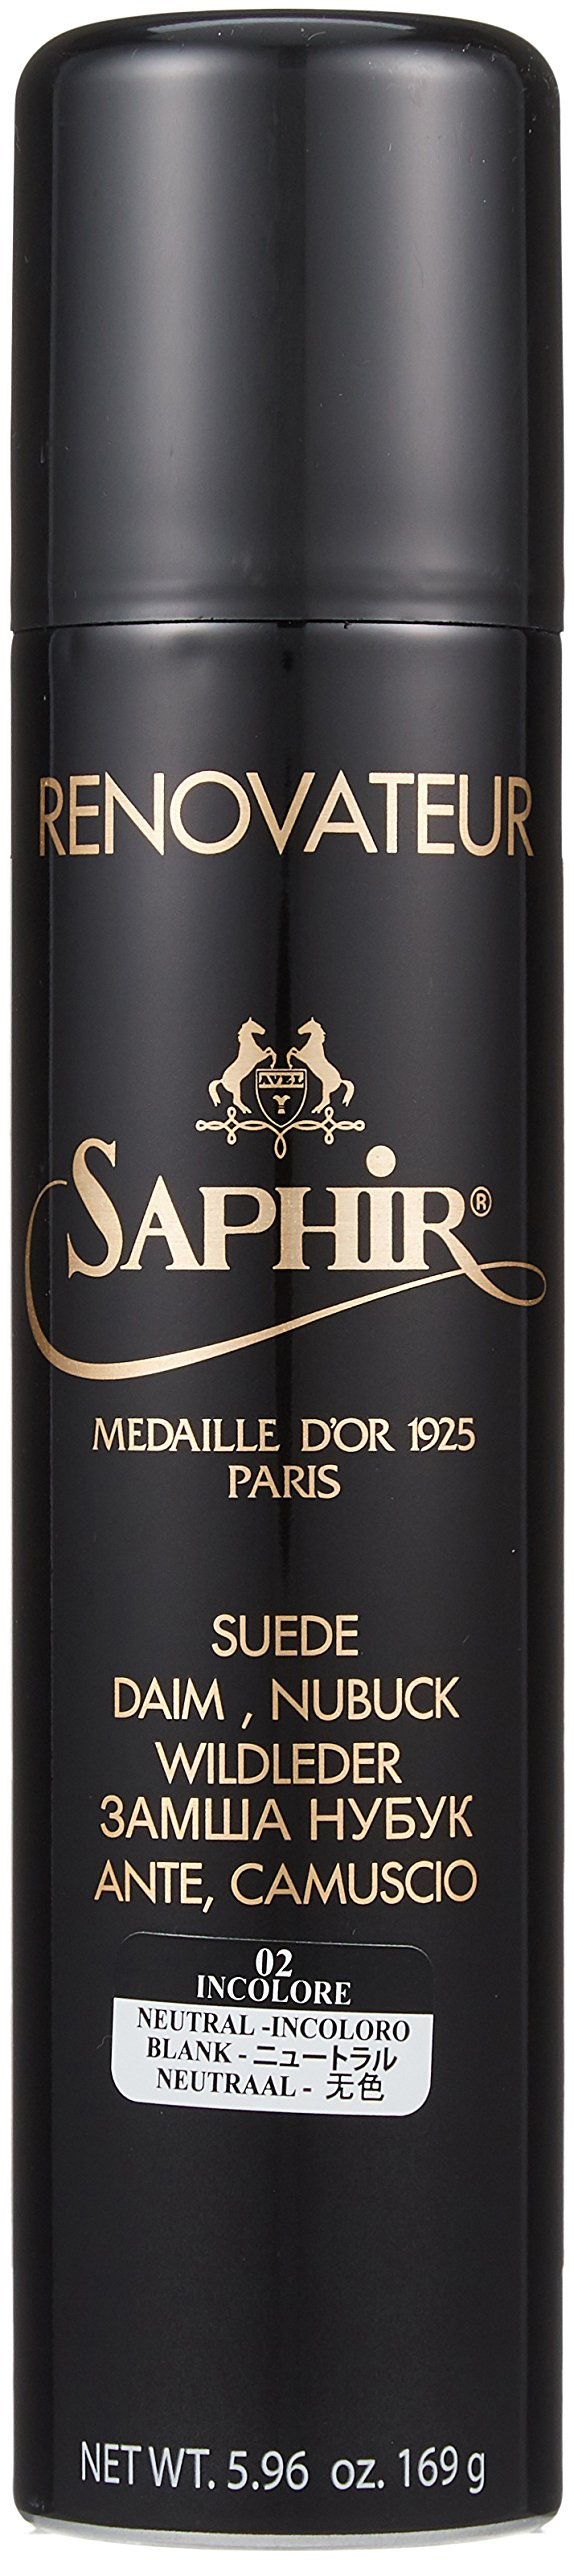 Saphir Medaille d'Or Suede Renovator - Neutro